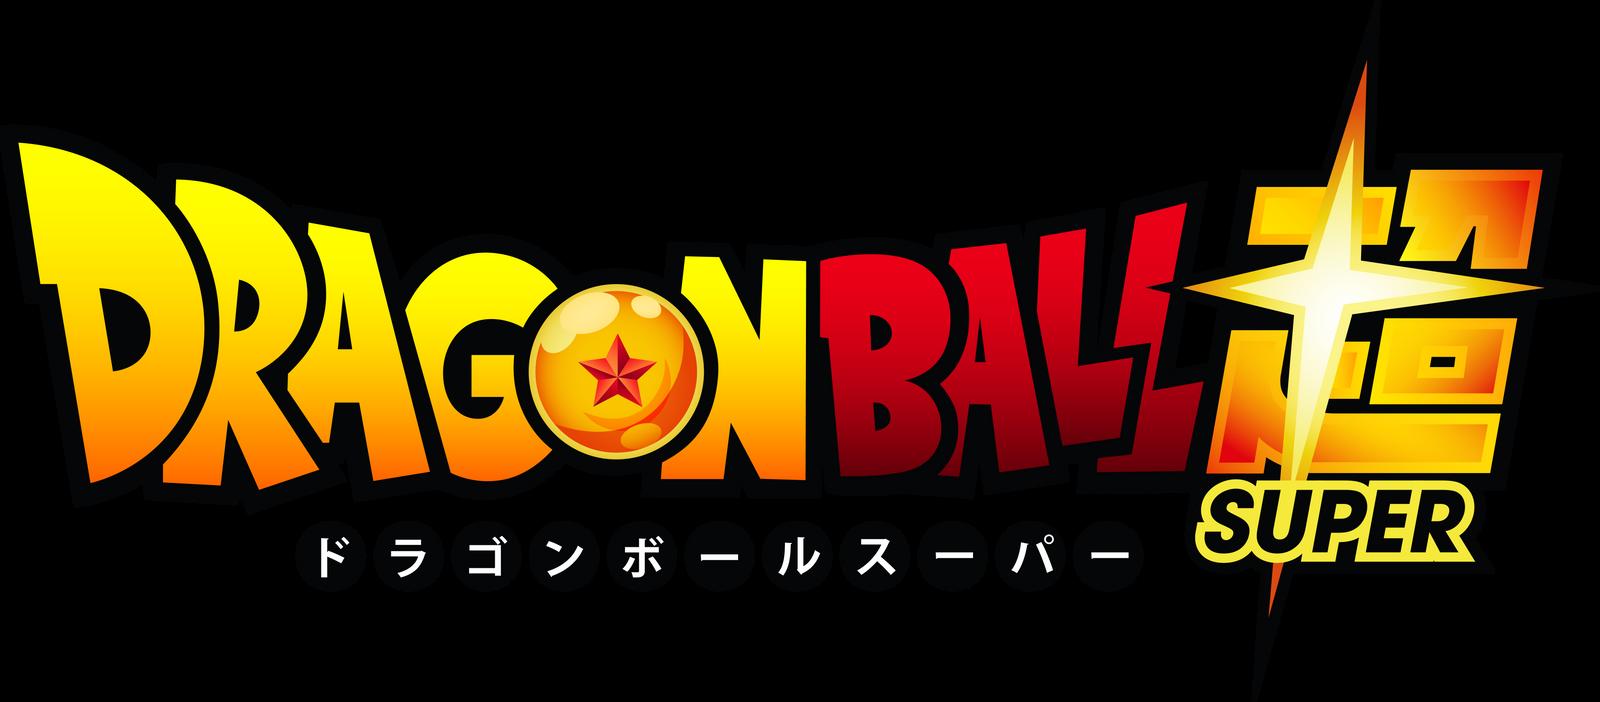 Dragon Ball Super Logo Png